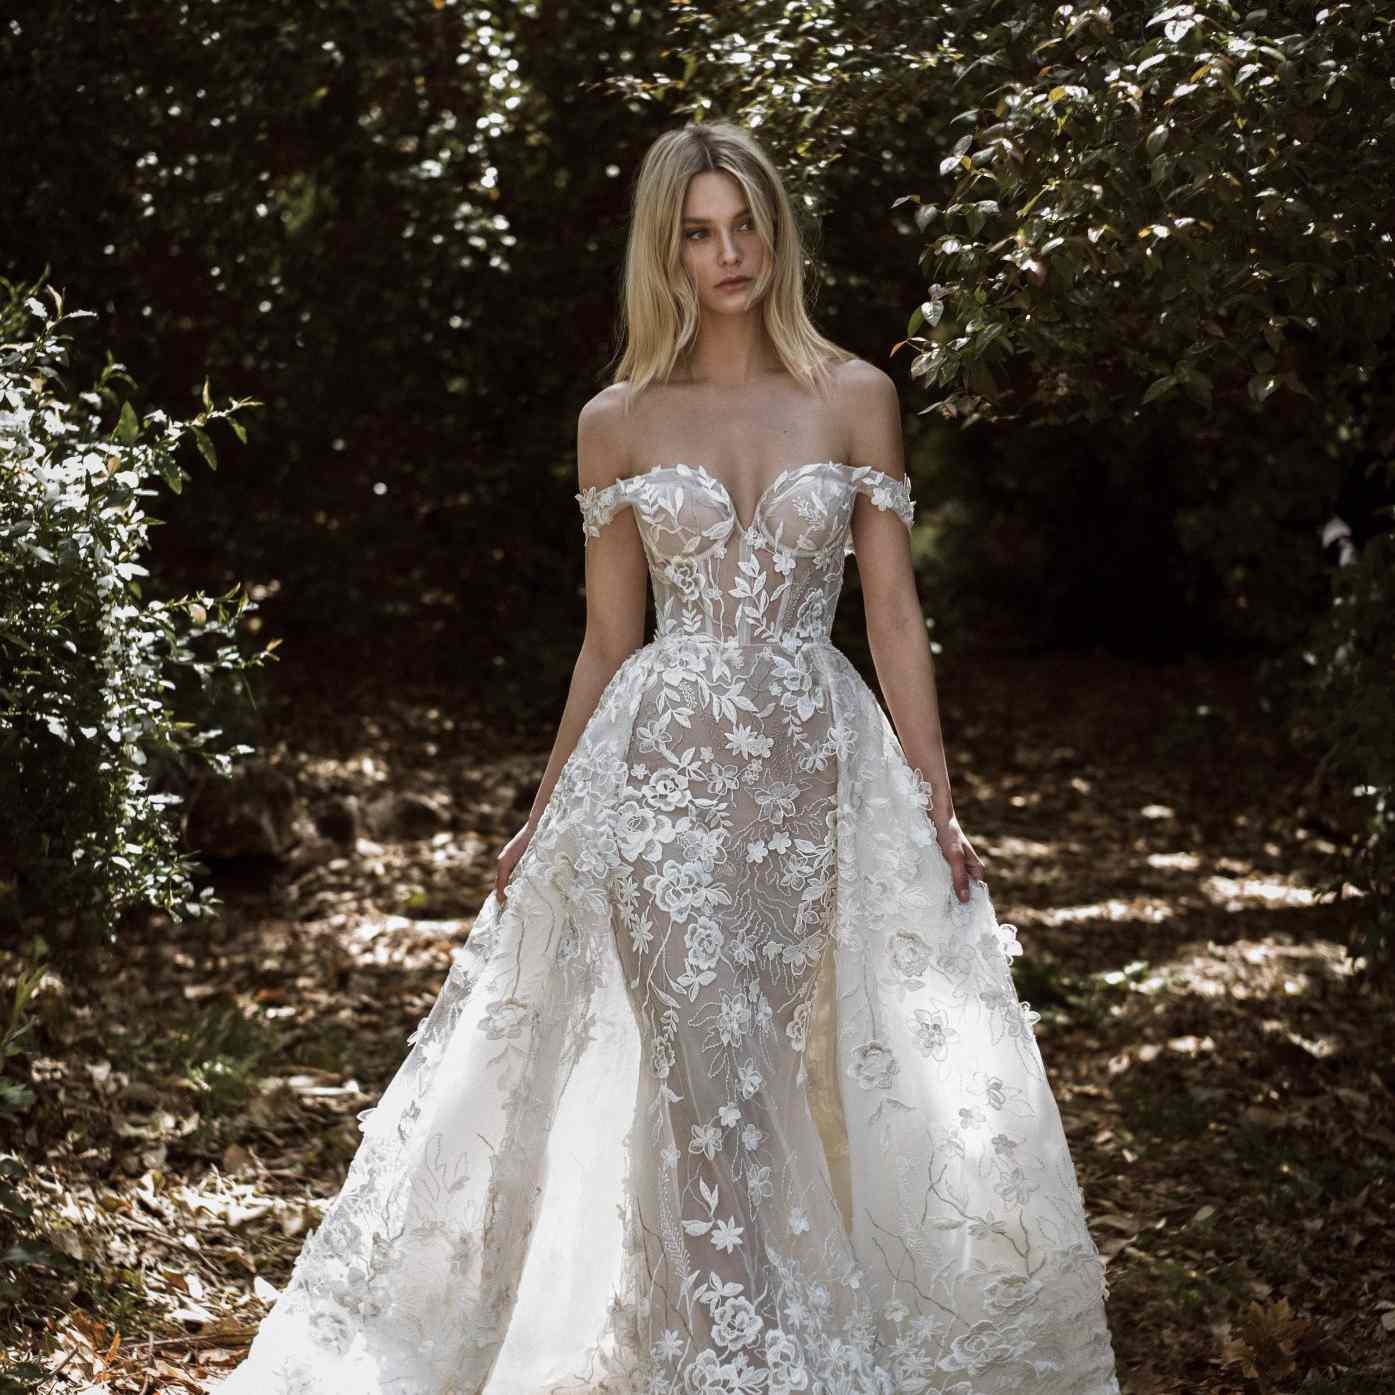 Alegra off-the-shoulder wedding dress